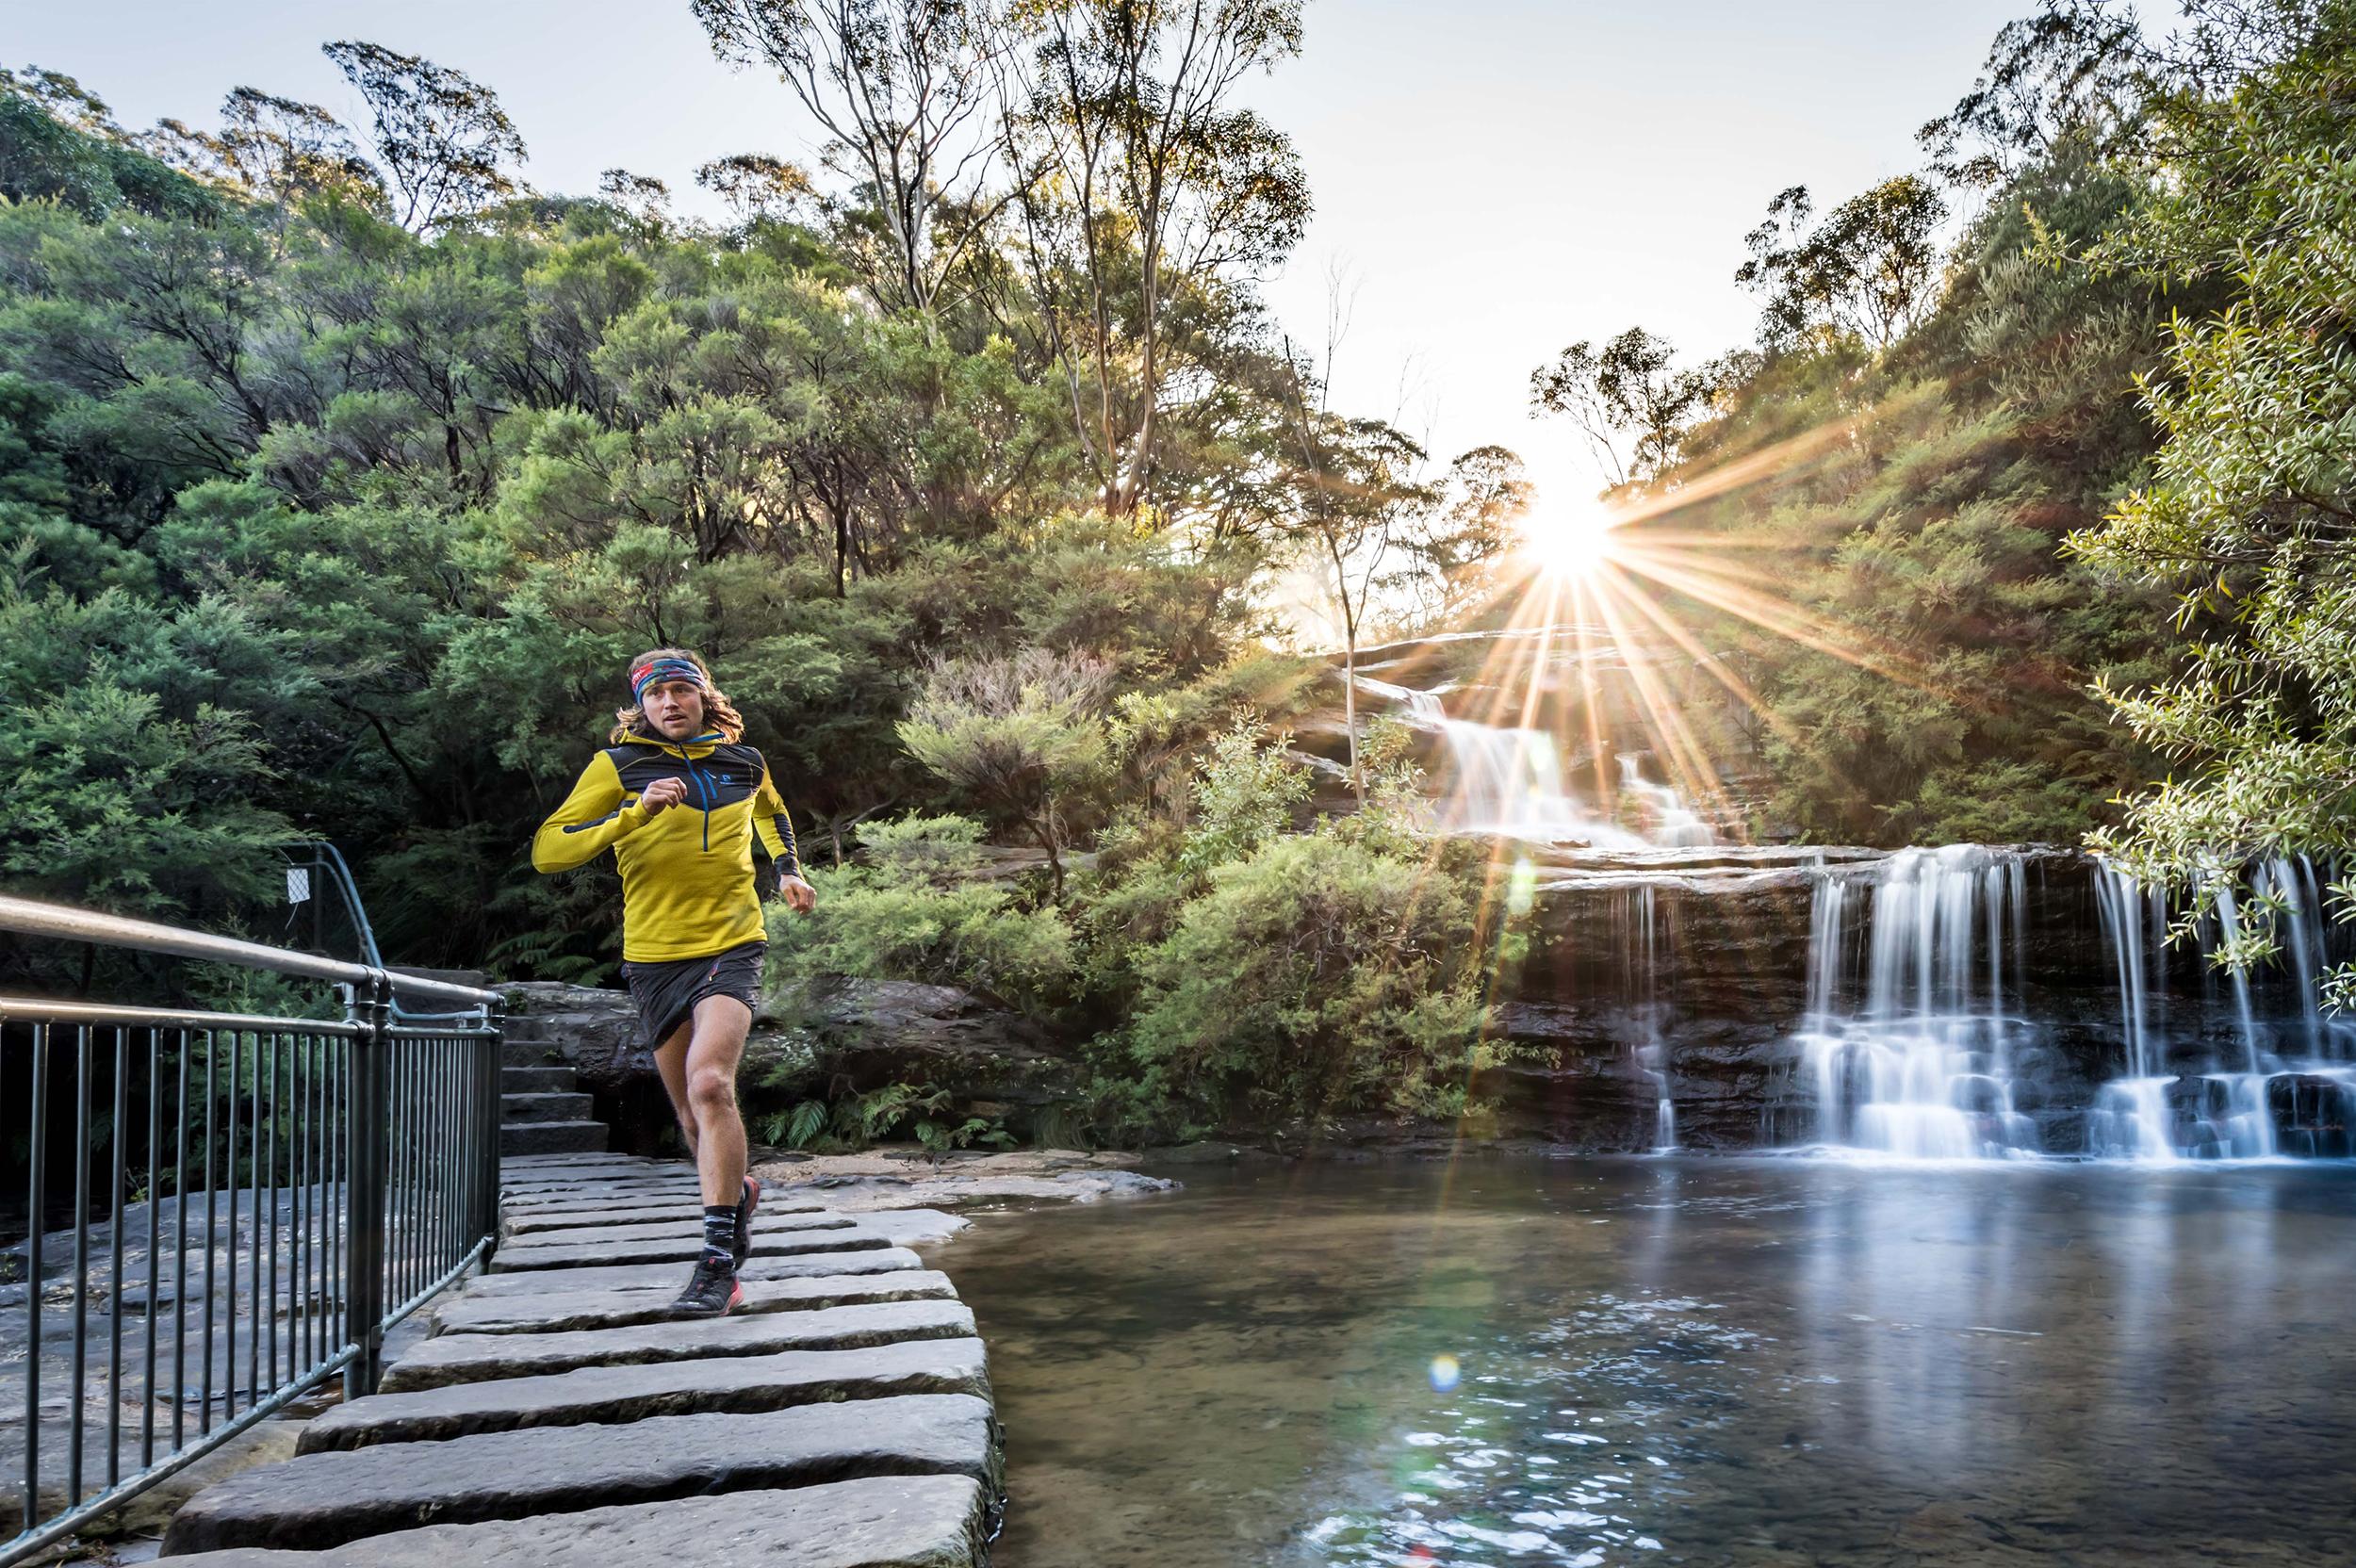 Elite runner Majell Backhausen at Wentworth Falls, Blue Mountains Australia